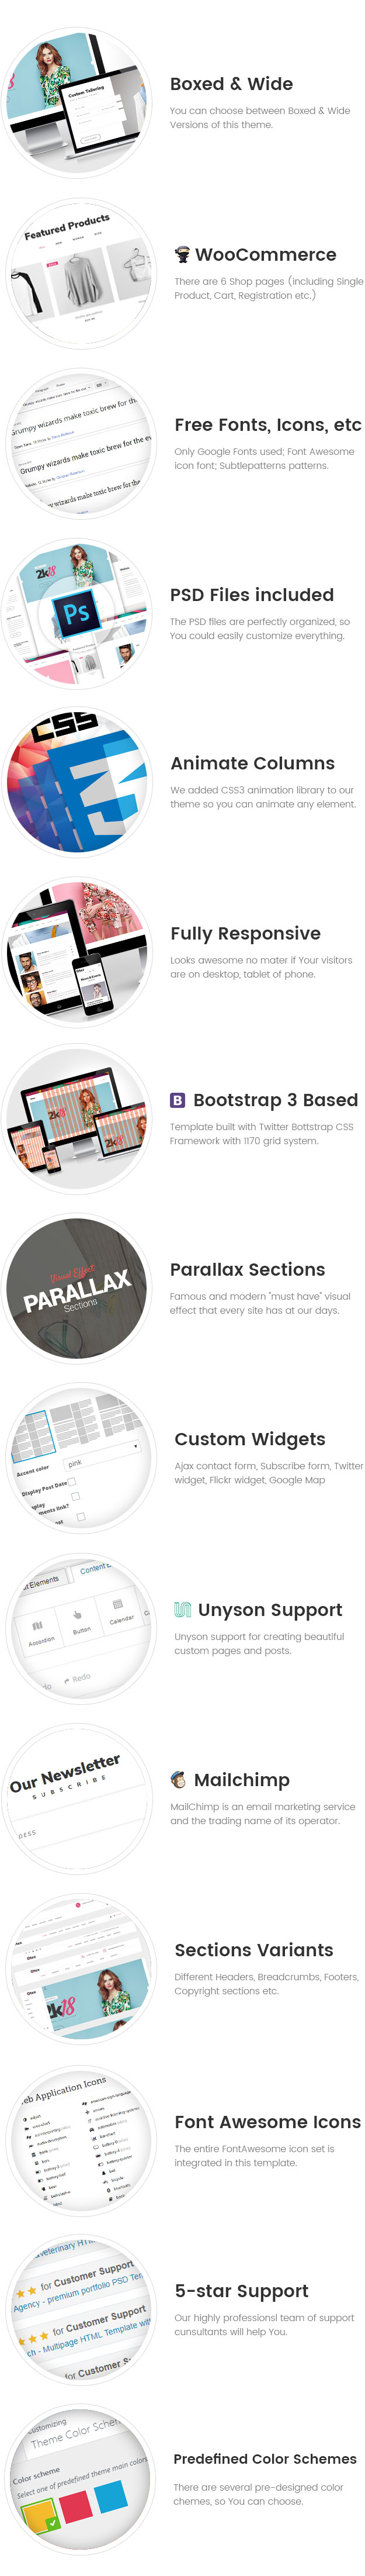 Qtex - Manufacturing and Clothing Company WordPress theme